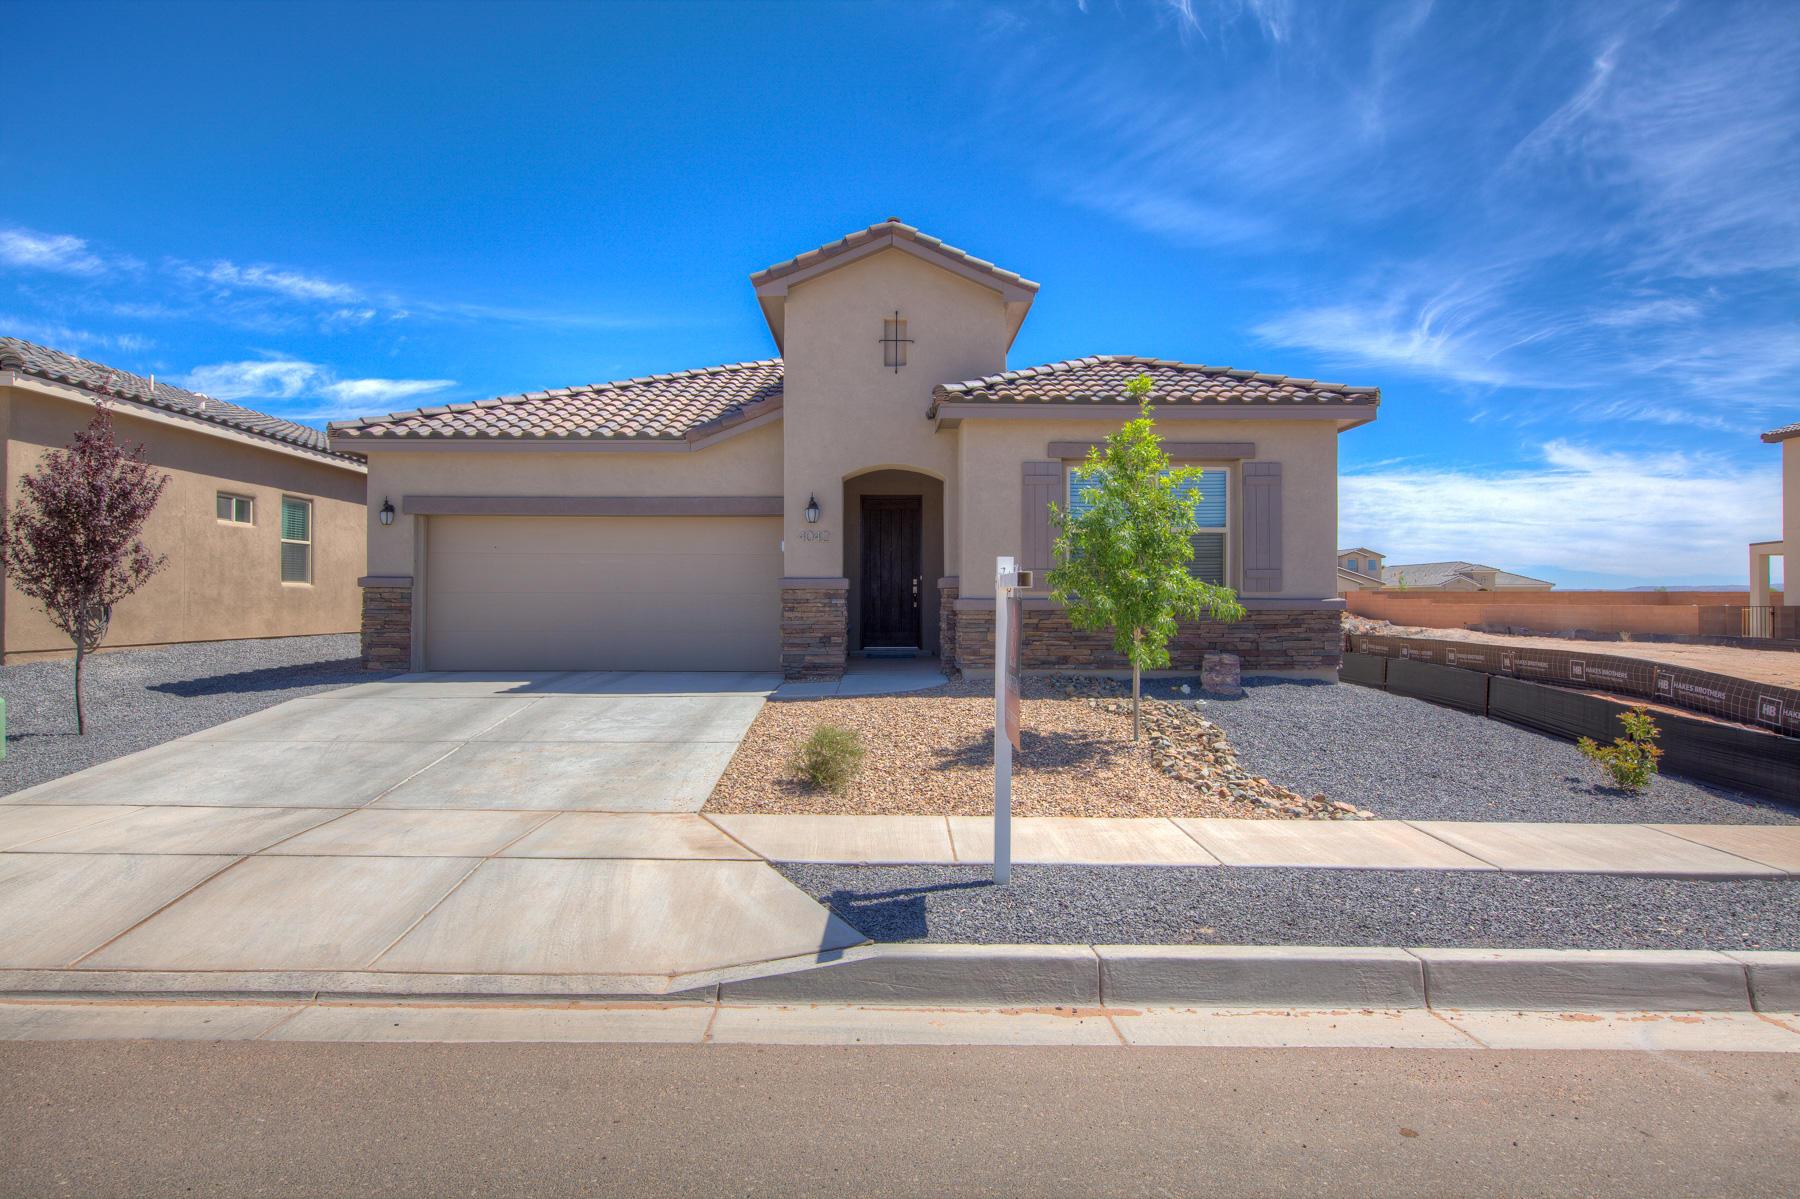 4042 Mountain Trail NE Property Photo - Rio Rancho, NM real estate listing